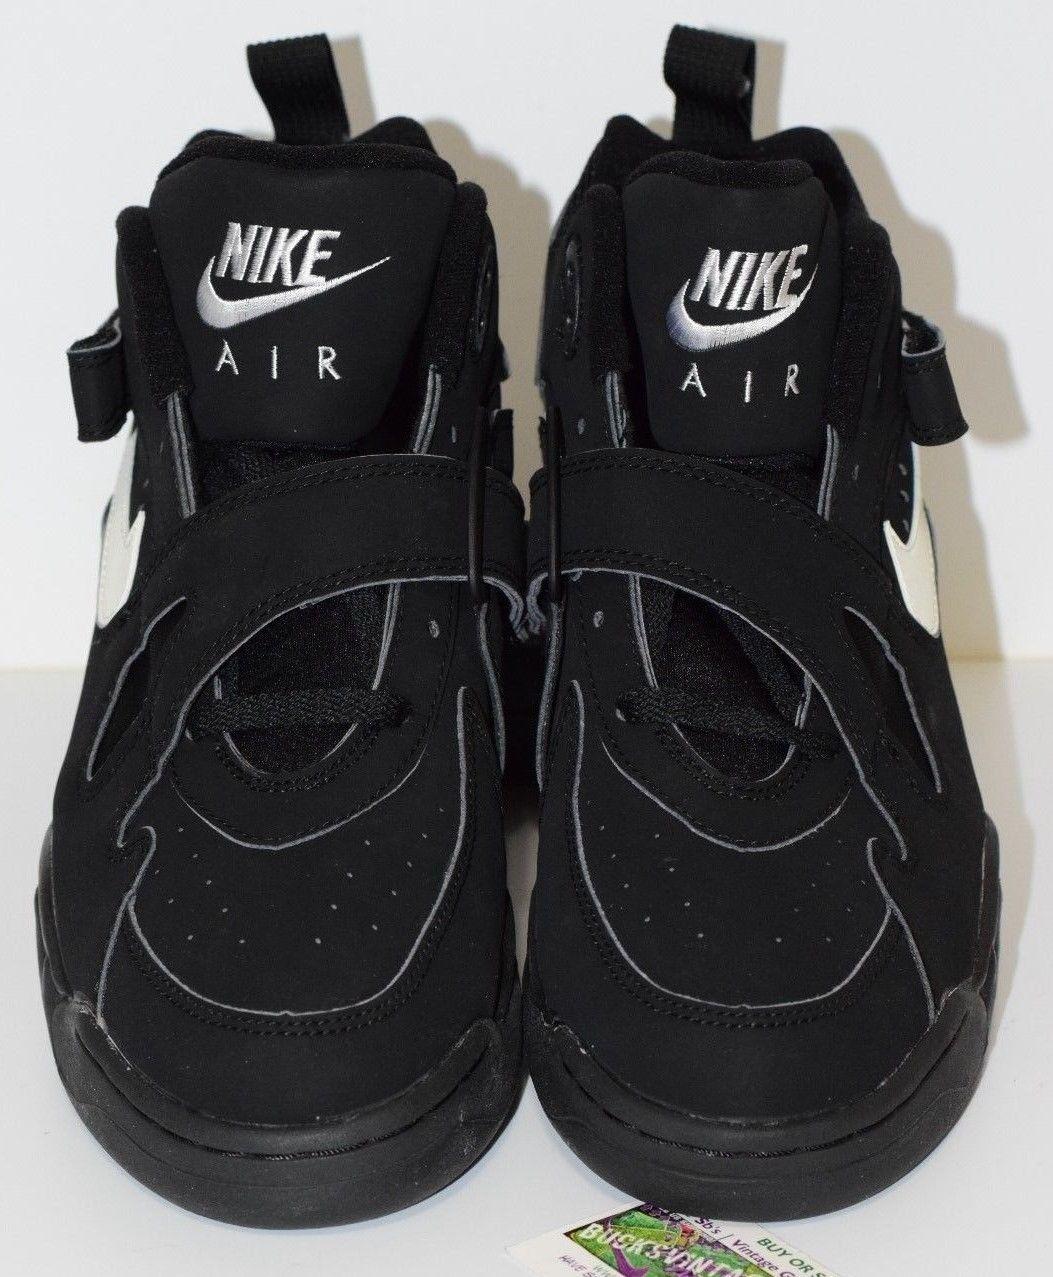 new styles 3c56f 8b4a1 Nike Air Max Cb 1993